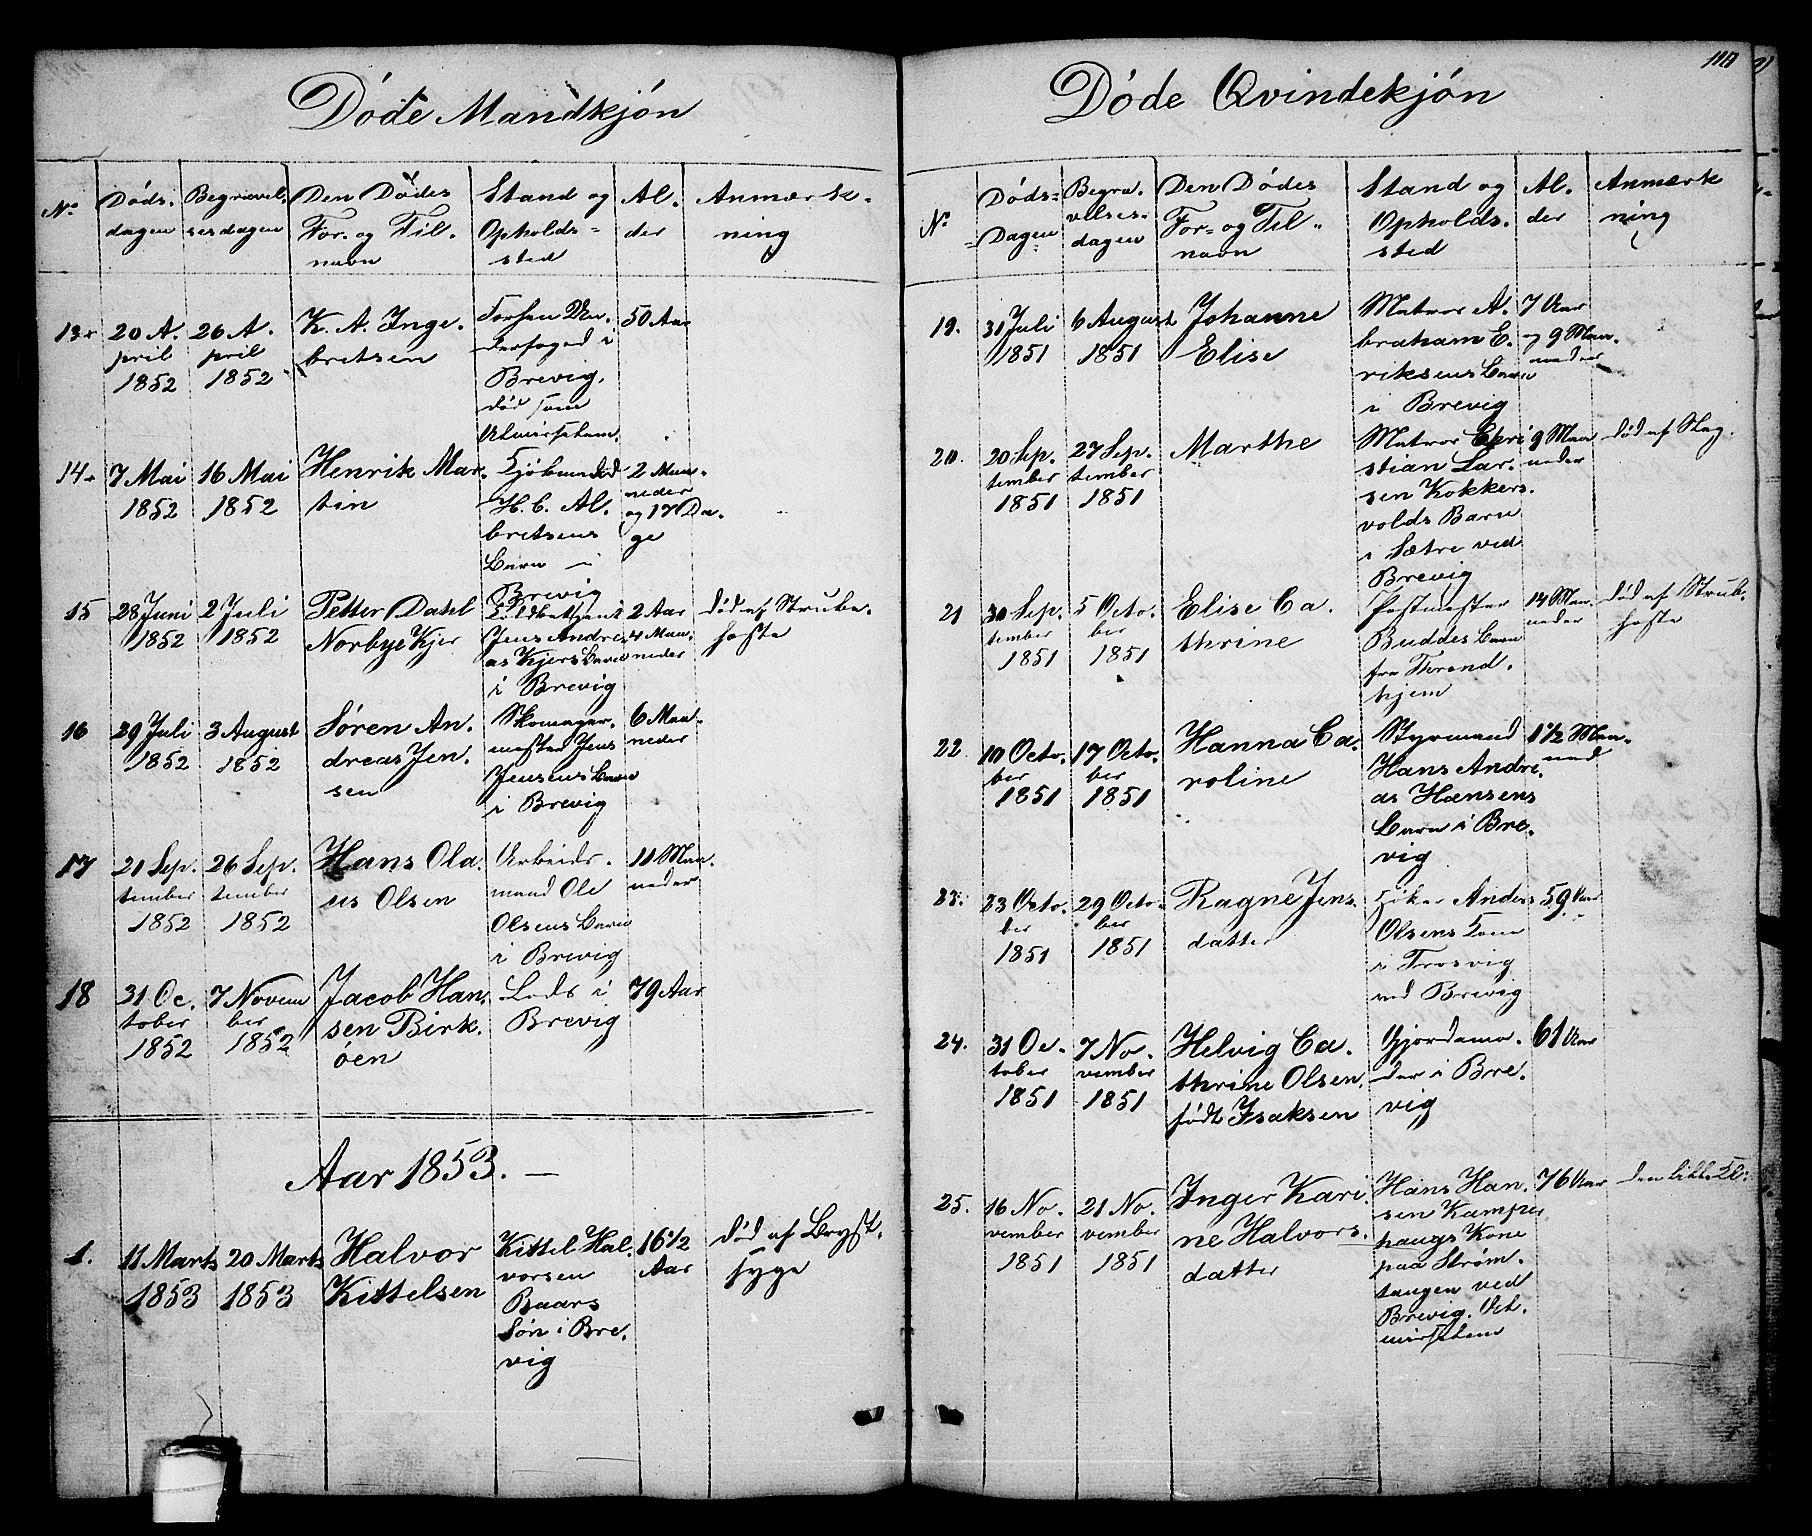 SAKO, Brevik kirkebøker, G/Ga/L0002: Klokkerbok nr. 2, 1846-1865, s. 110